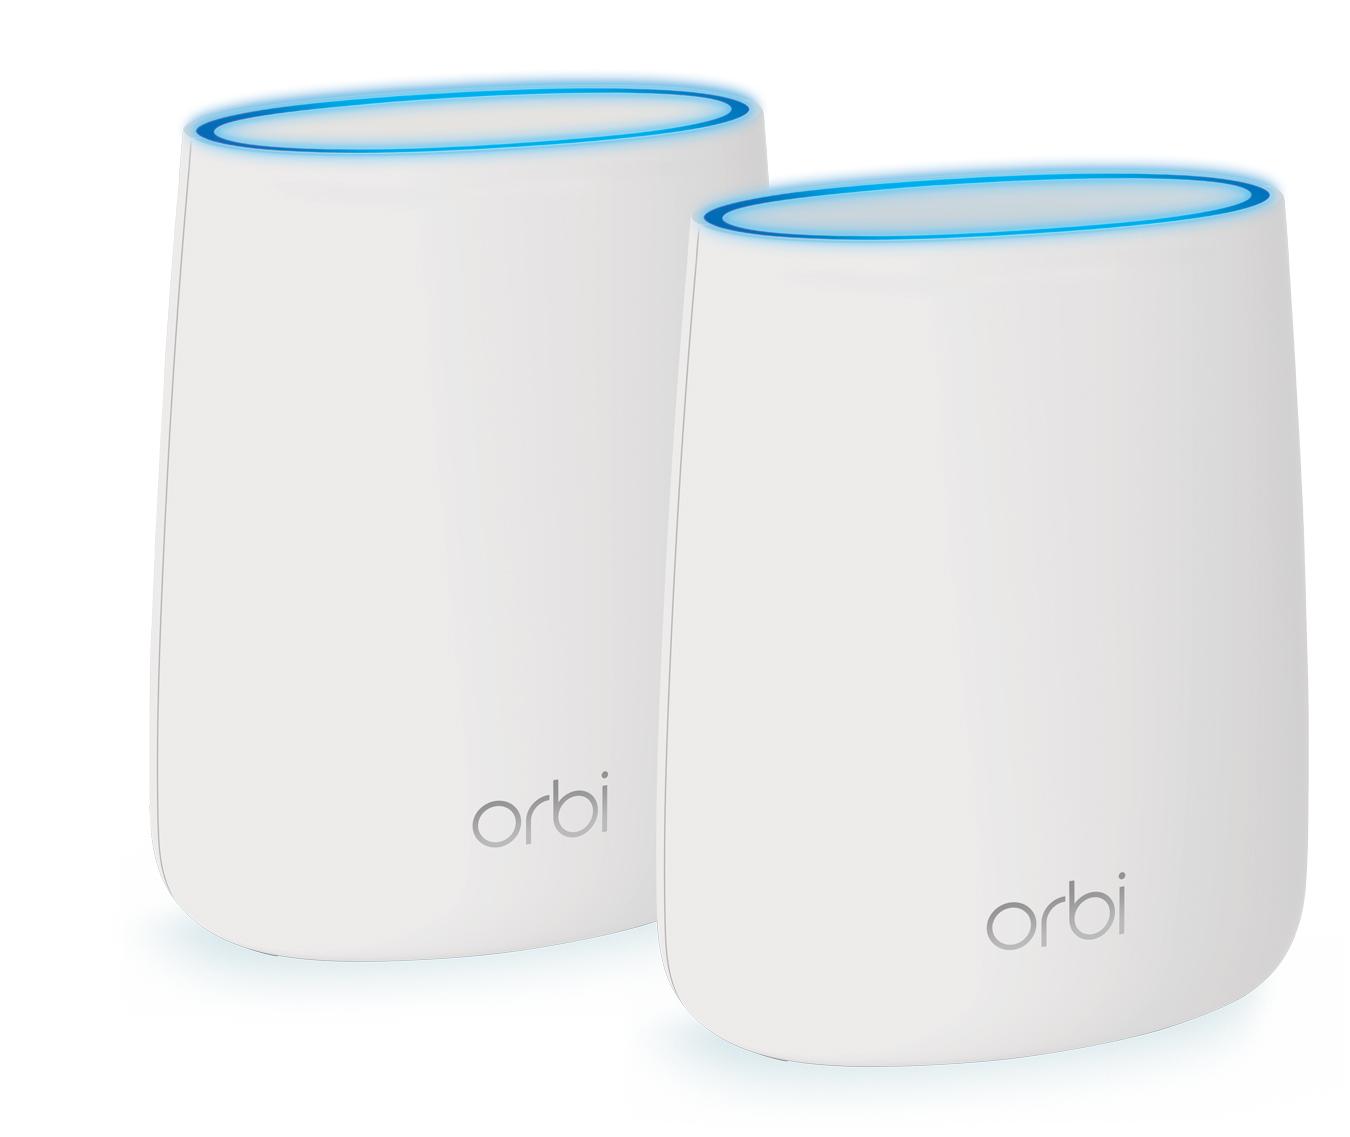 Netgear RBK20-100AUS Orbi Whole Home AC2200 Tri-band WiFi System (Router & Satellite)